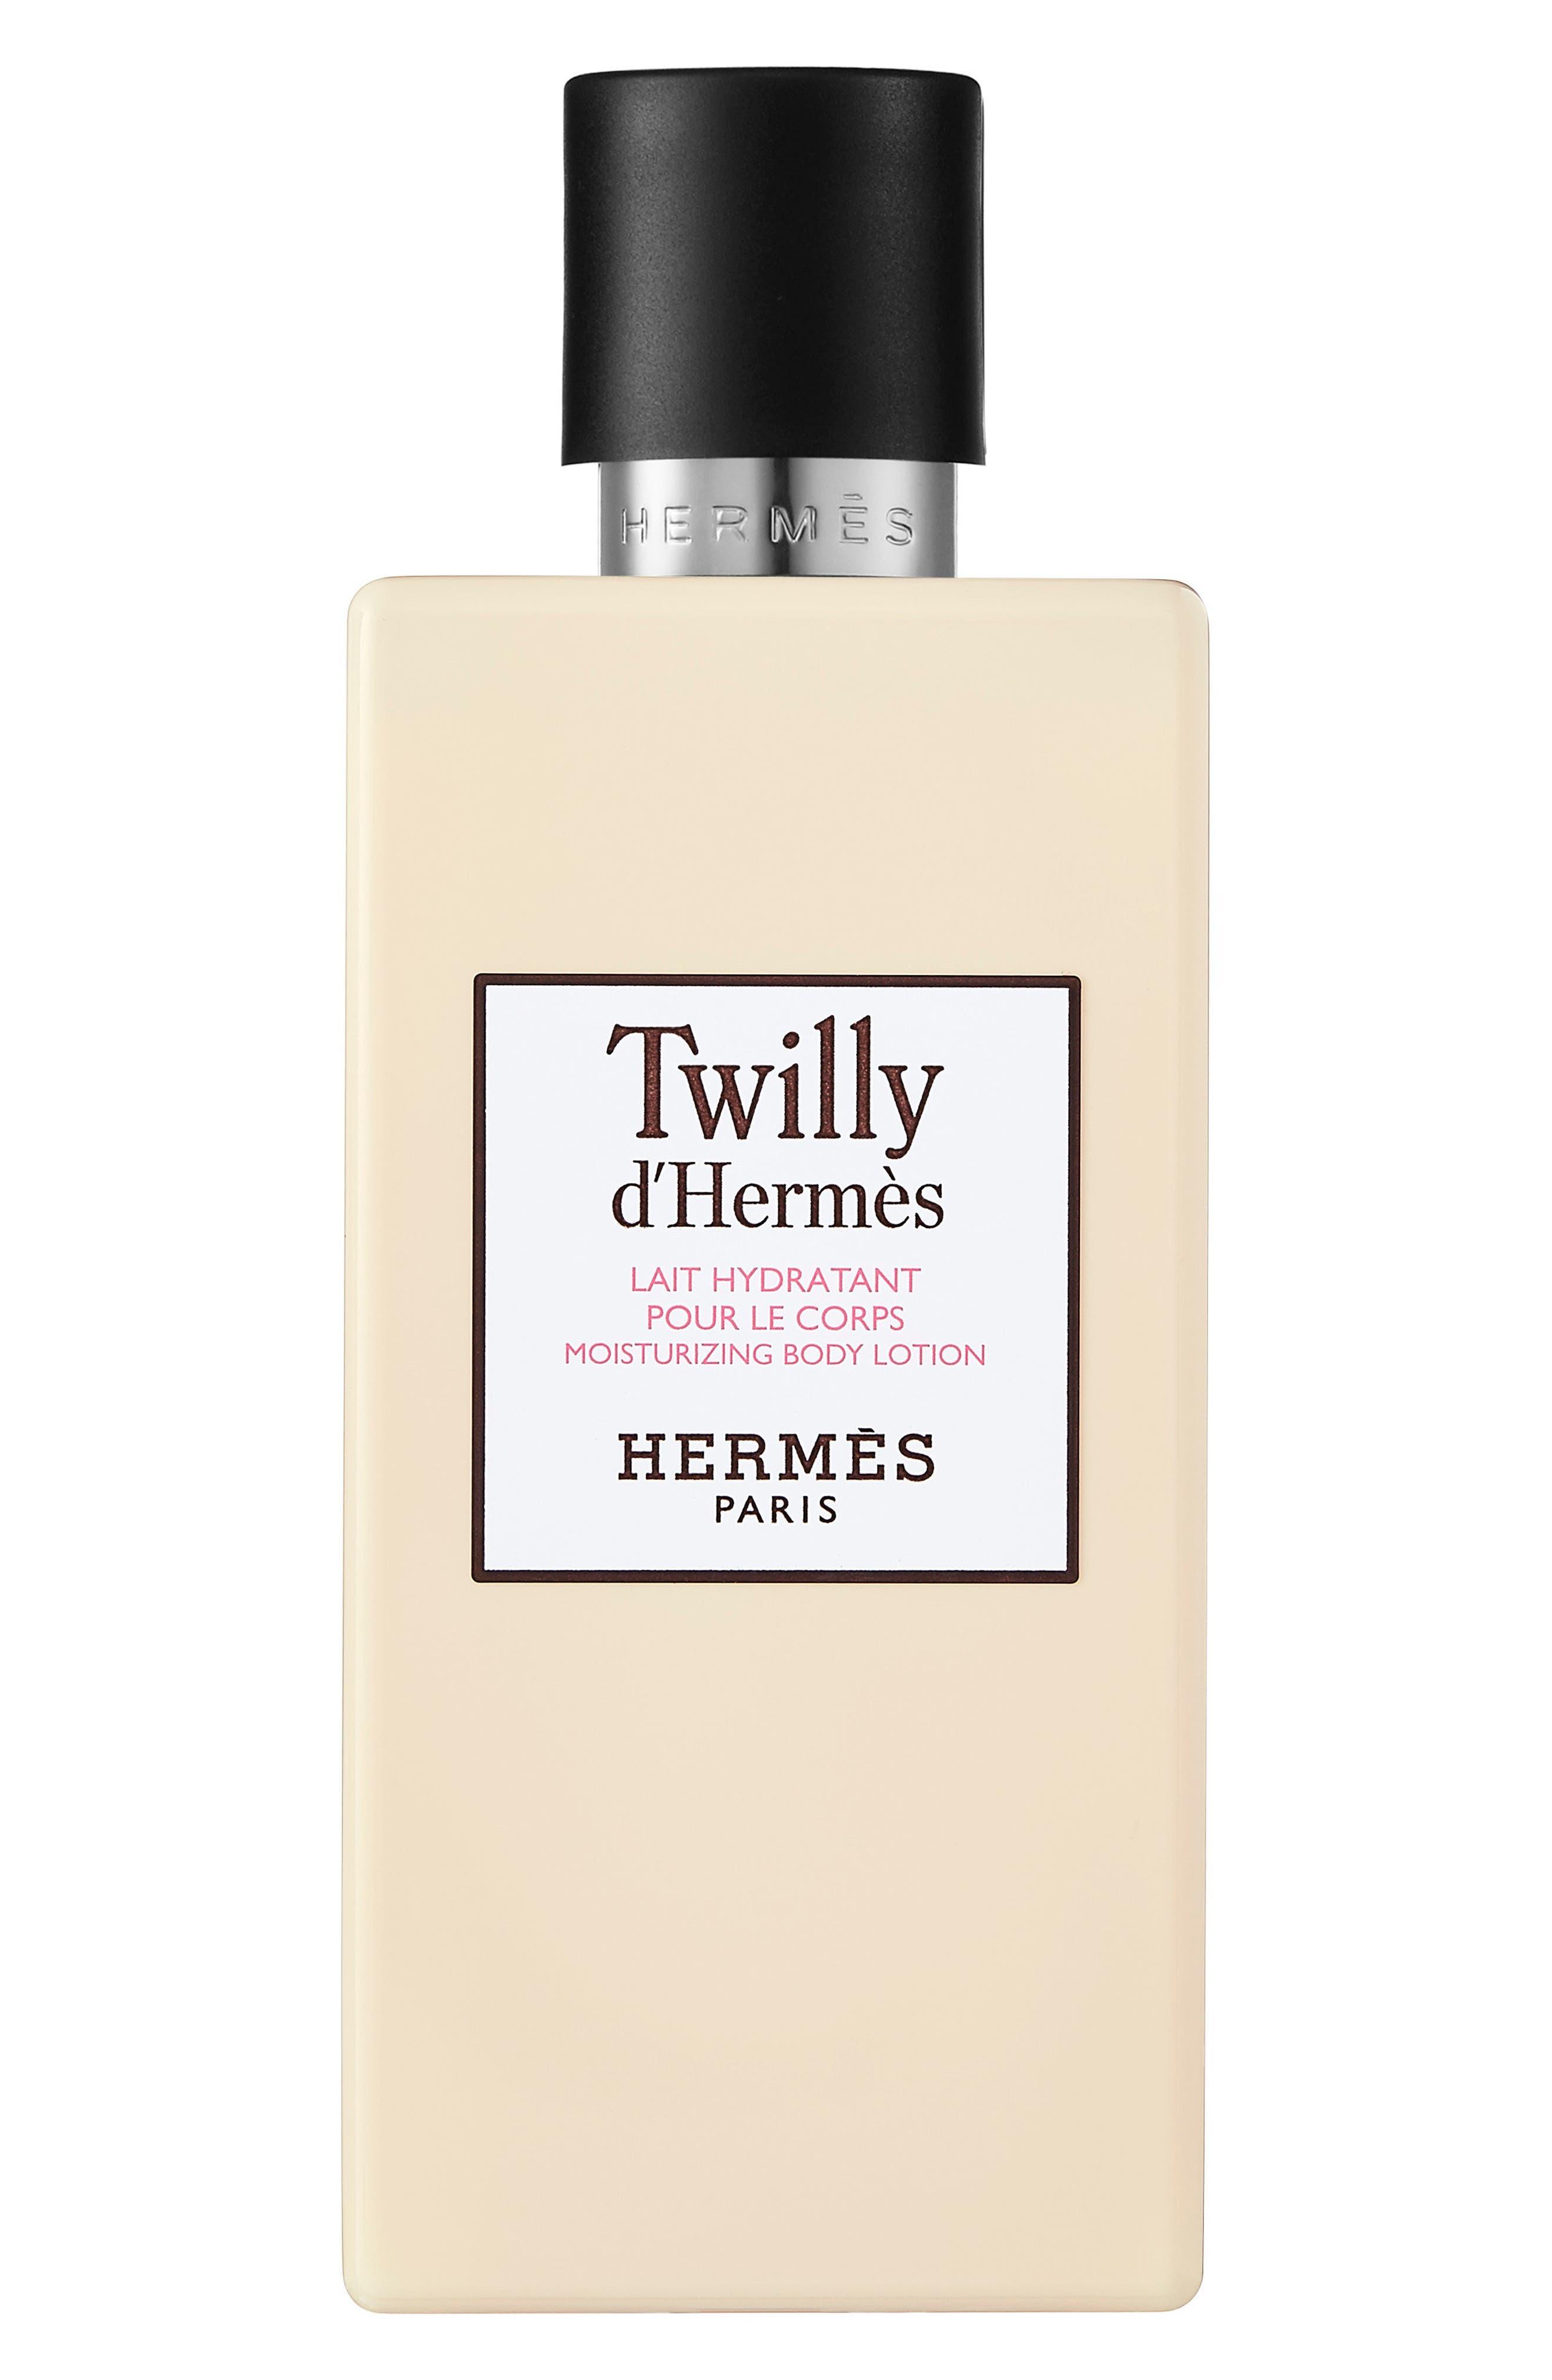 HERMÈS Twilly d'Hermès - Moisturizing body lotion, Main, color, NO COLOR